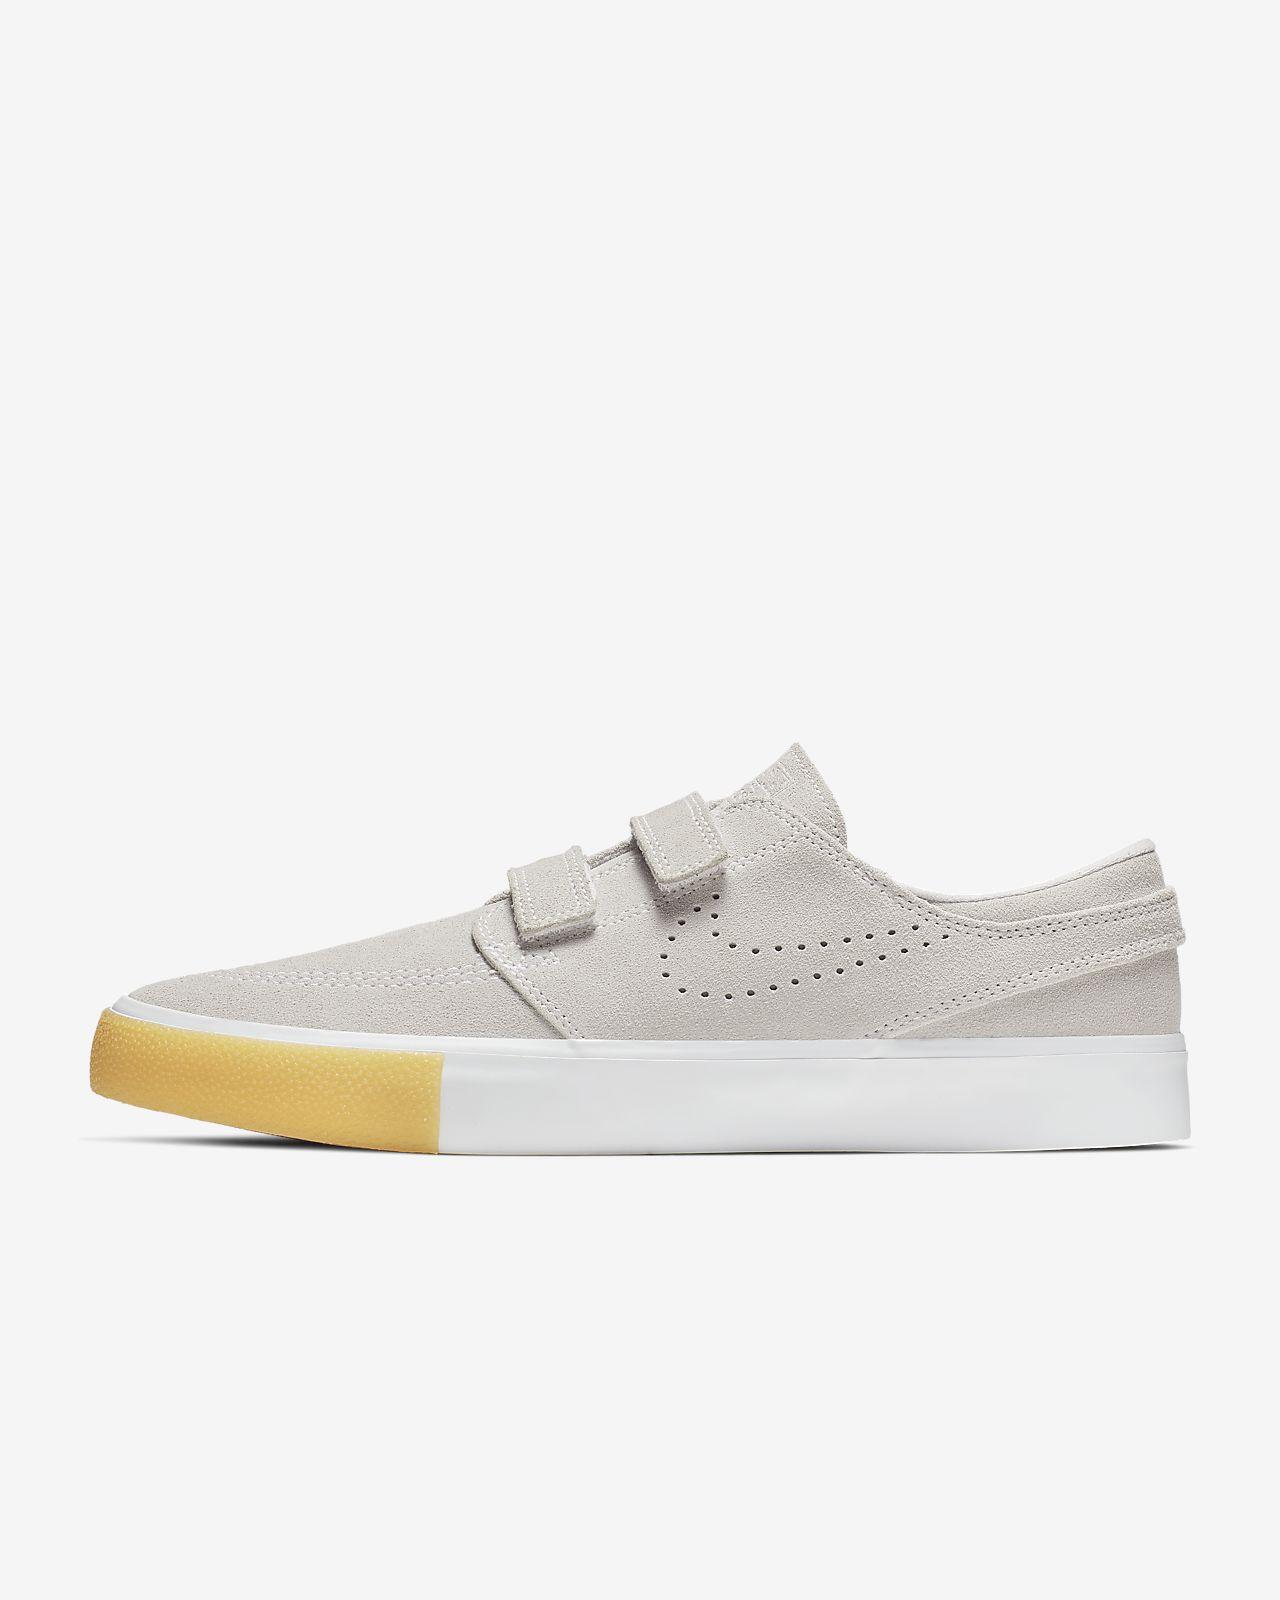 Calzado de skateboarding Nike SB Zoom Stefan Janoski AC RM SE